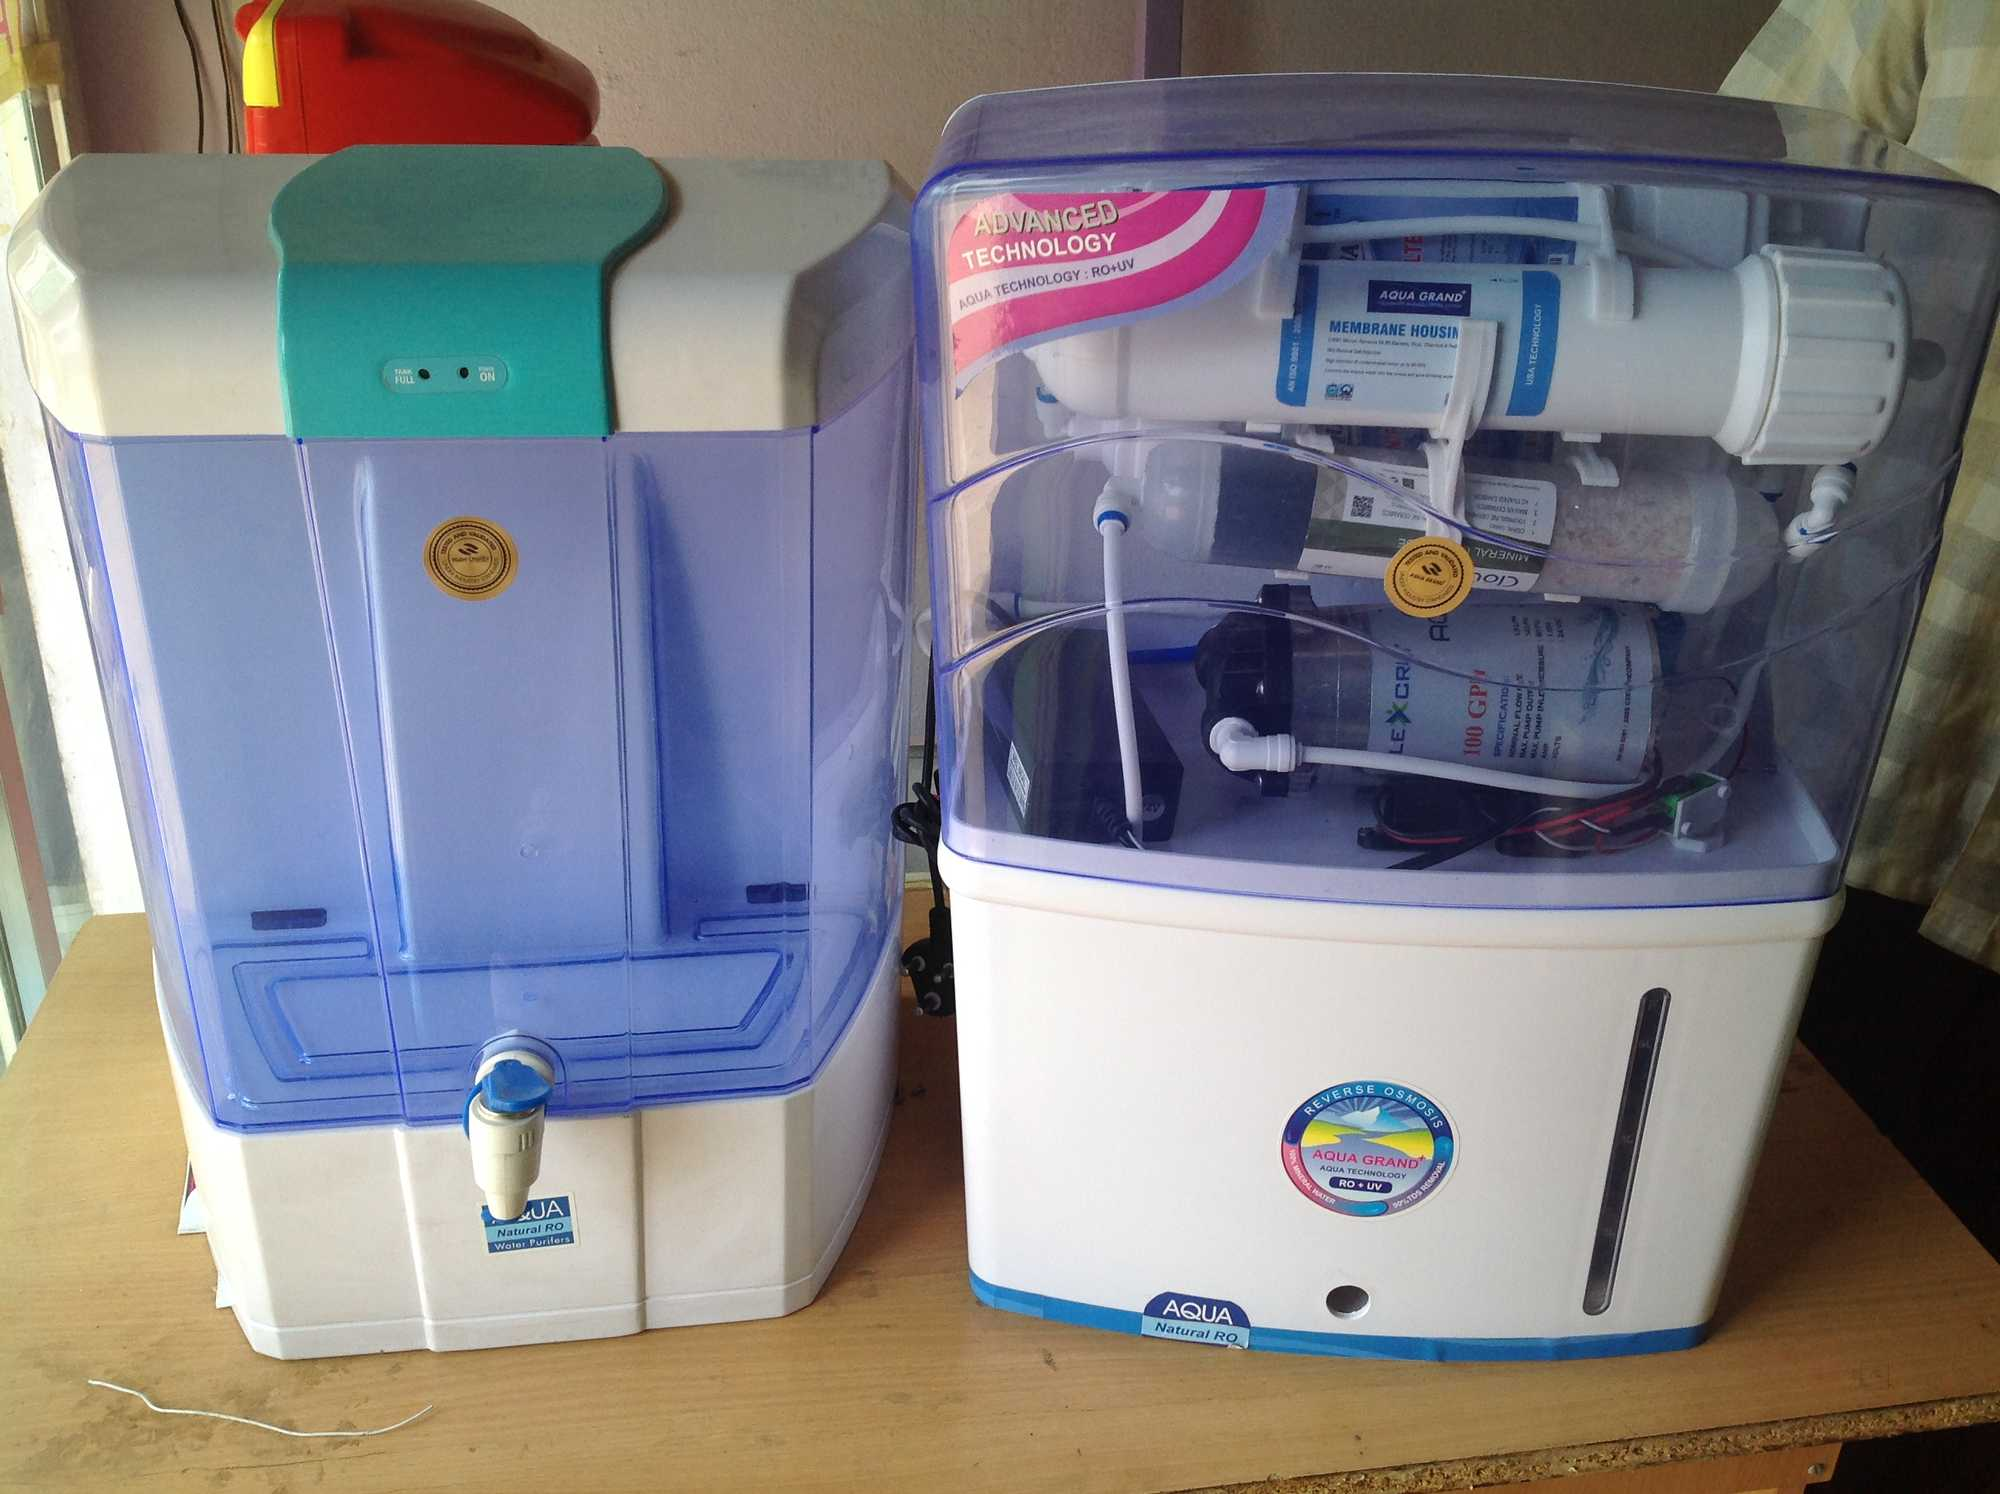 9a6a4e765a Aquaguard Ro Water Purifier Repair & Services in Kamala Nagar, Hyderabad